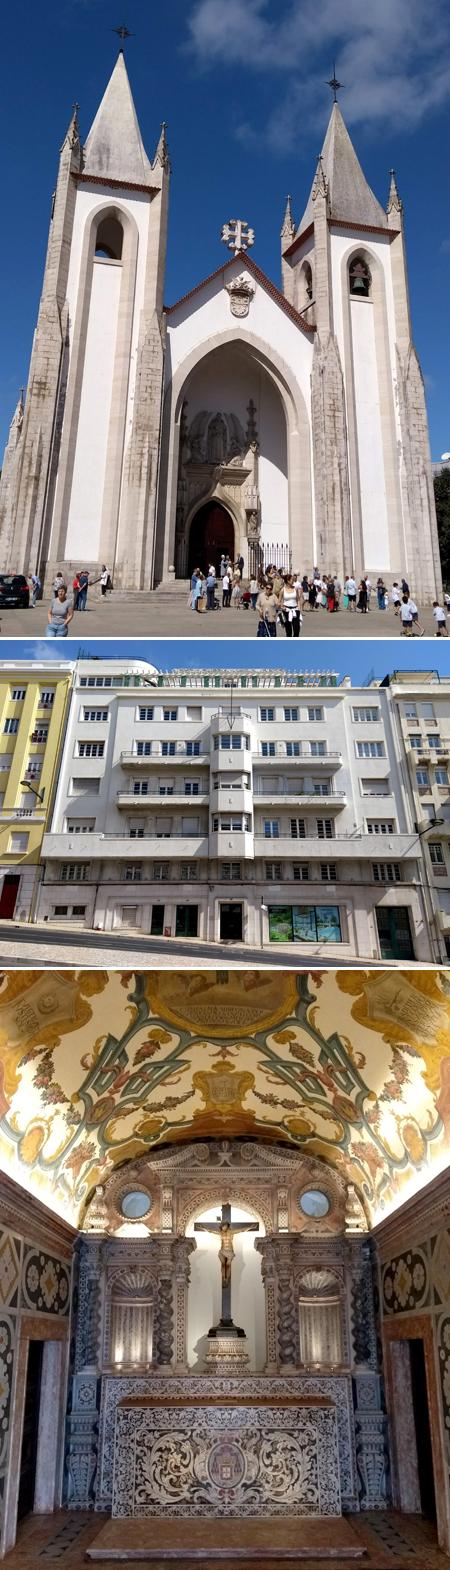 Rick Steves, guidebook research, Portugal, Lisboa